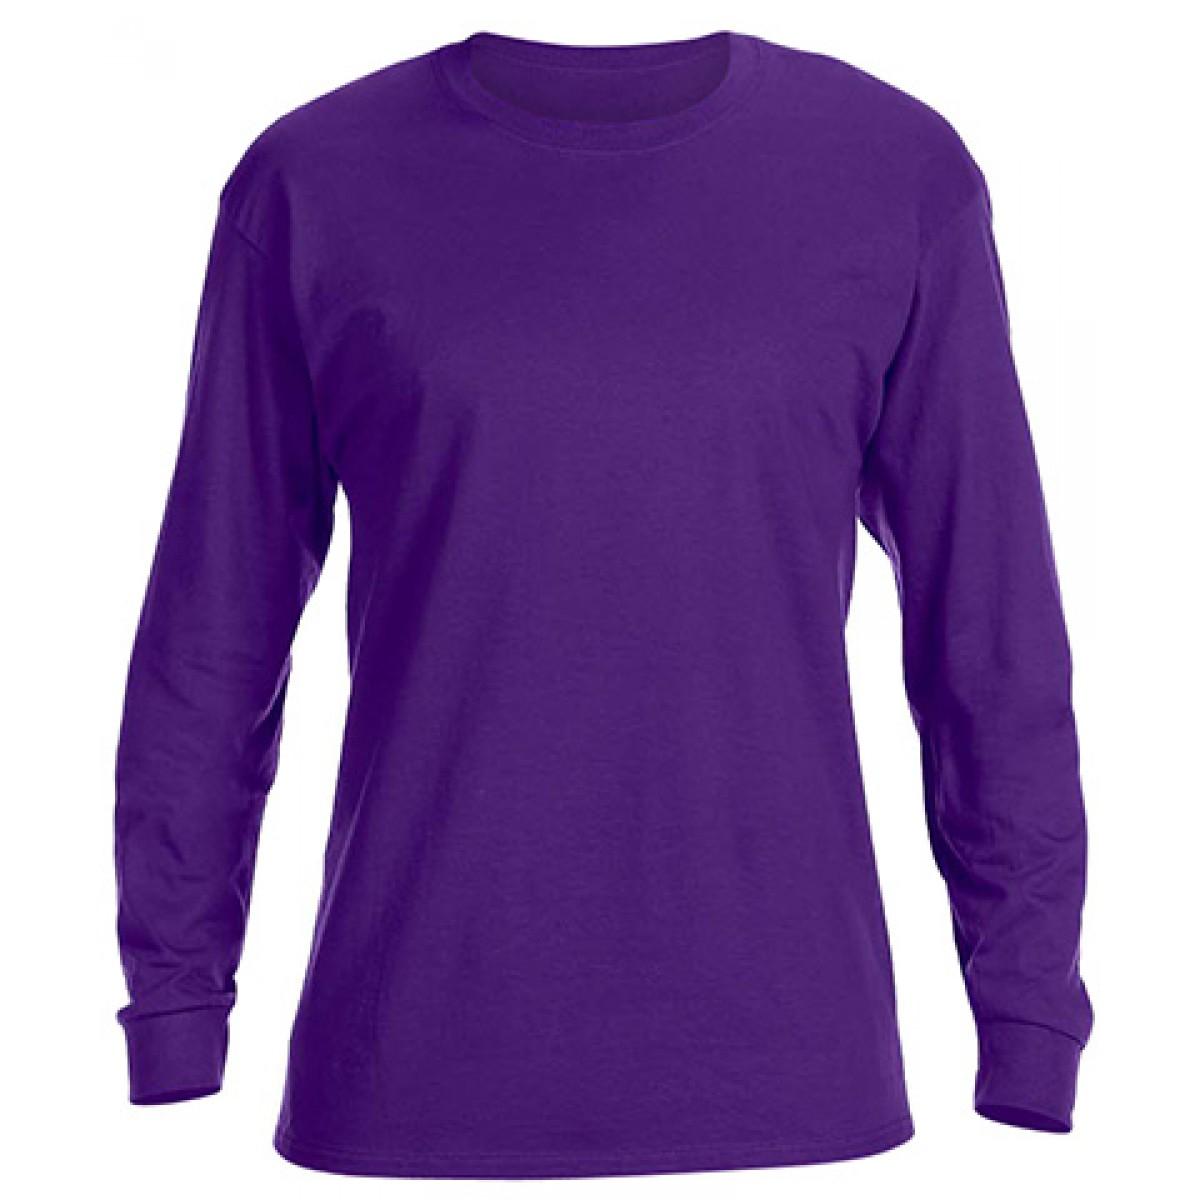 Basic Long Sleeve Crew Neck -Purple-YL